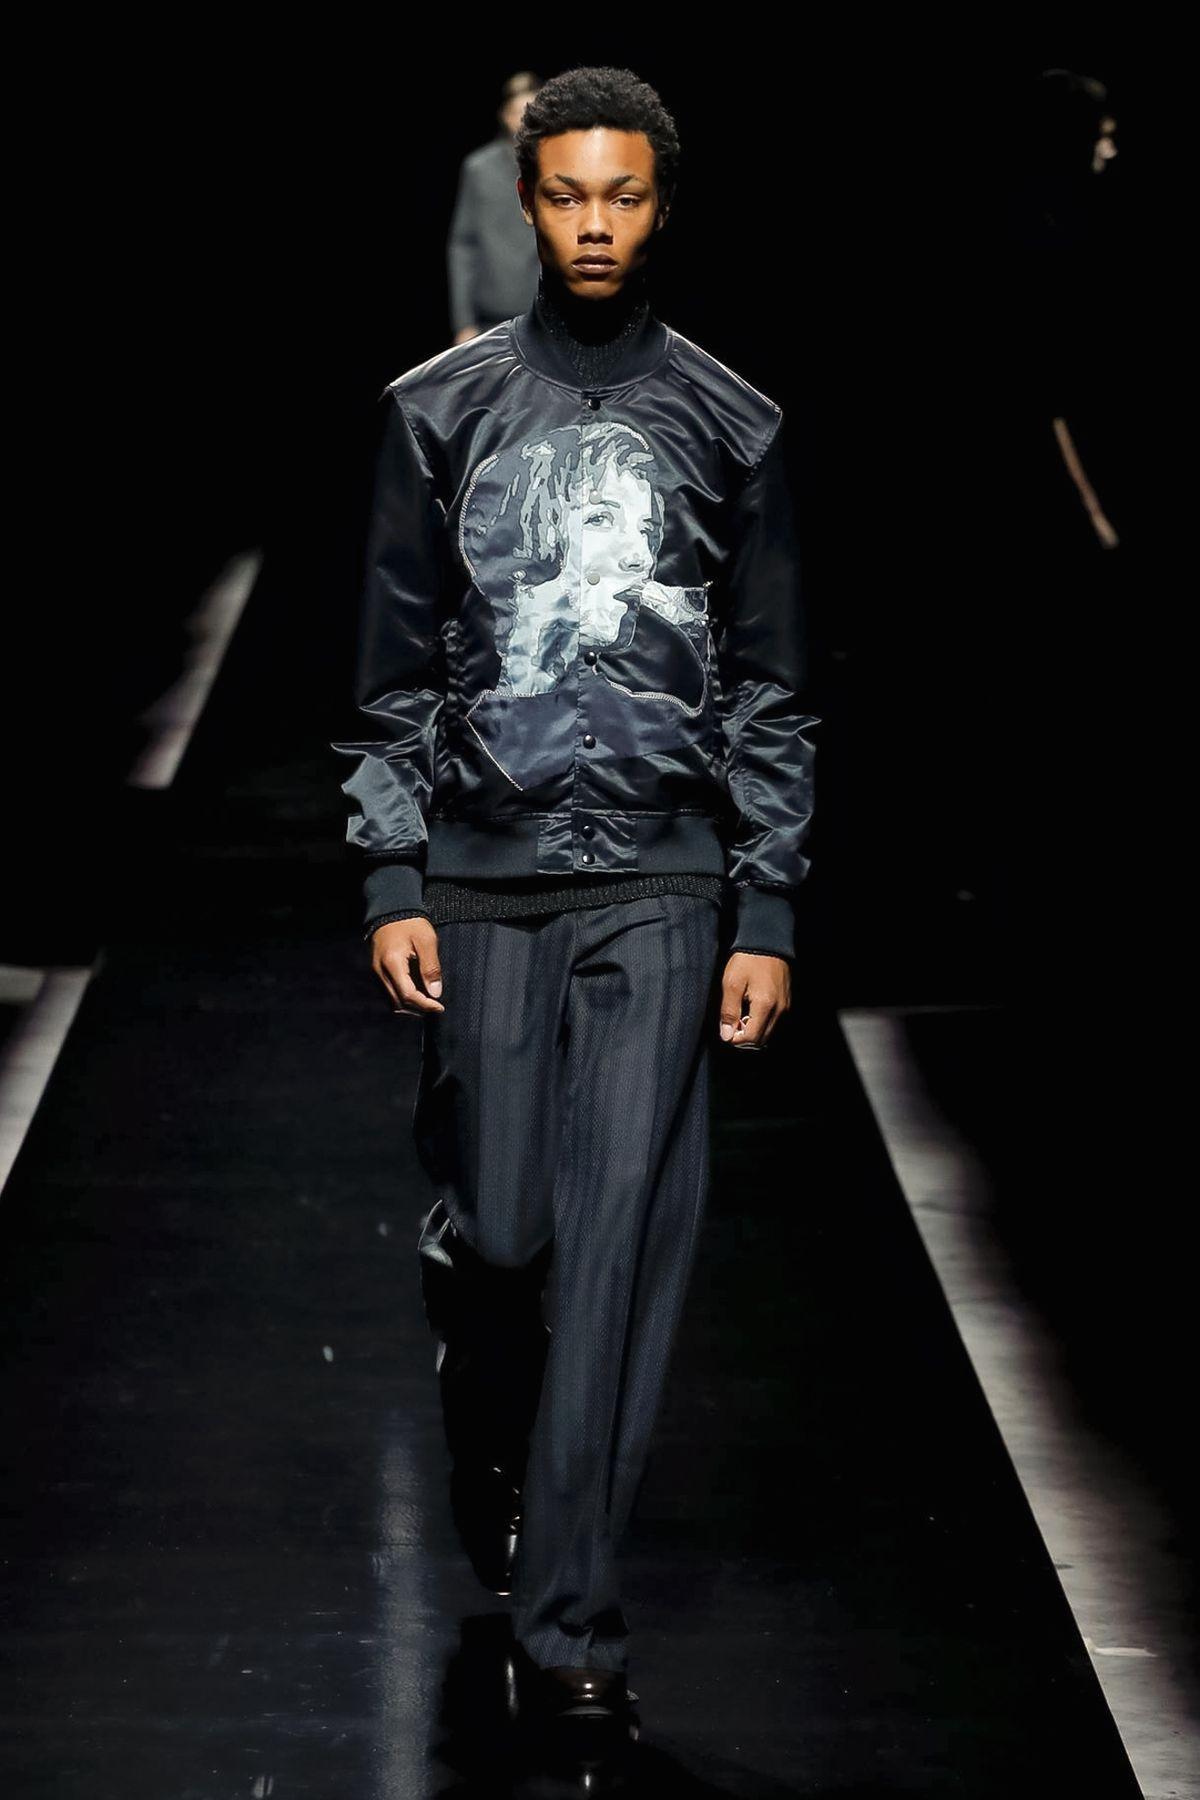 Образ из коллекции Undercover Spring/Summer 2020 Menswear